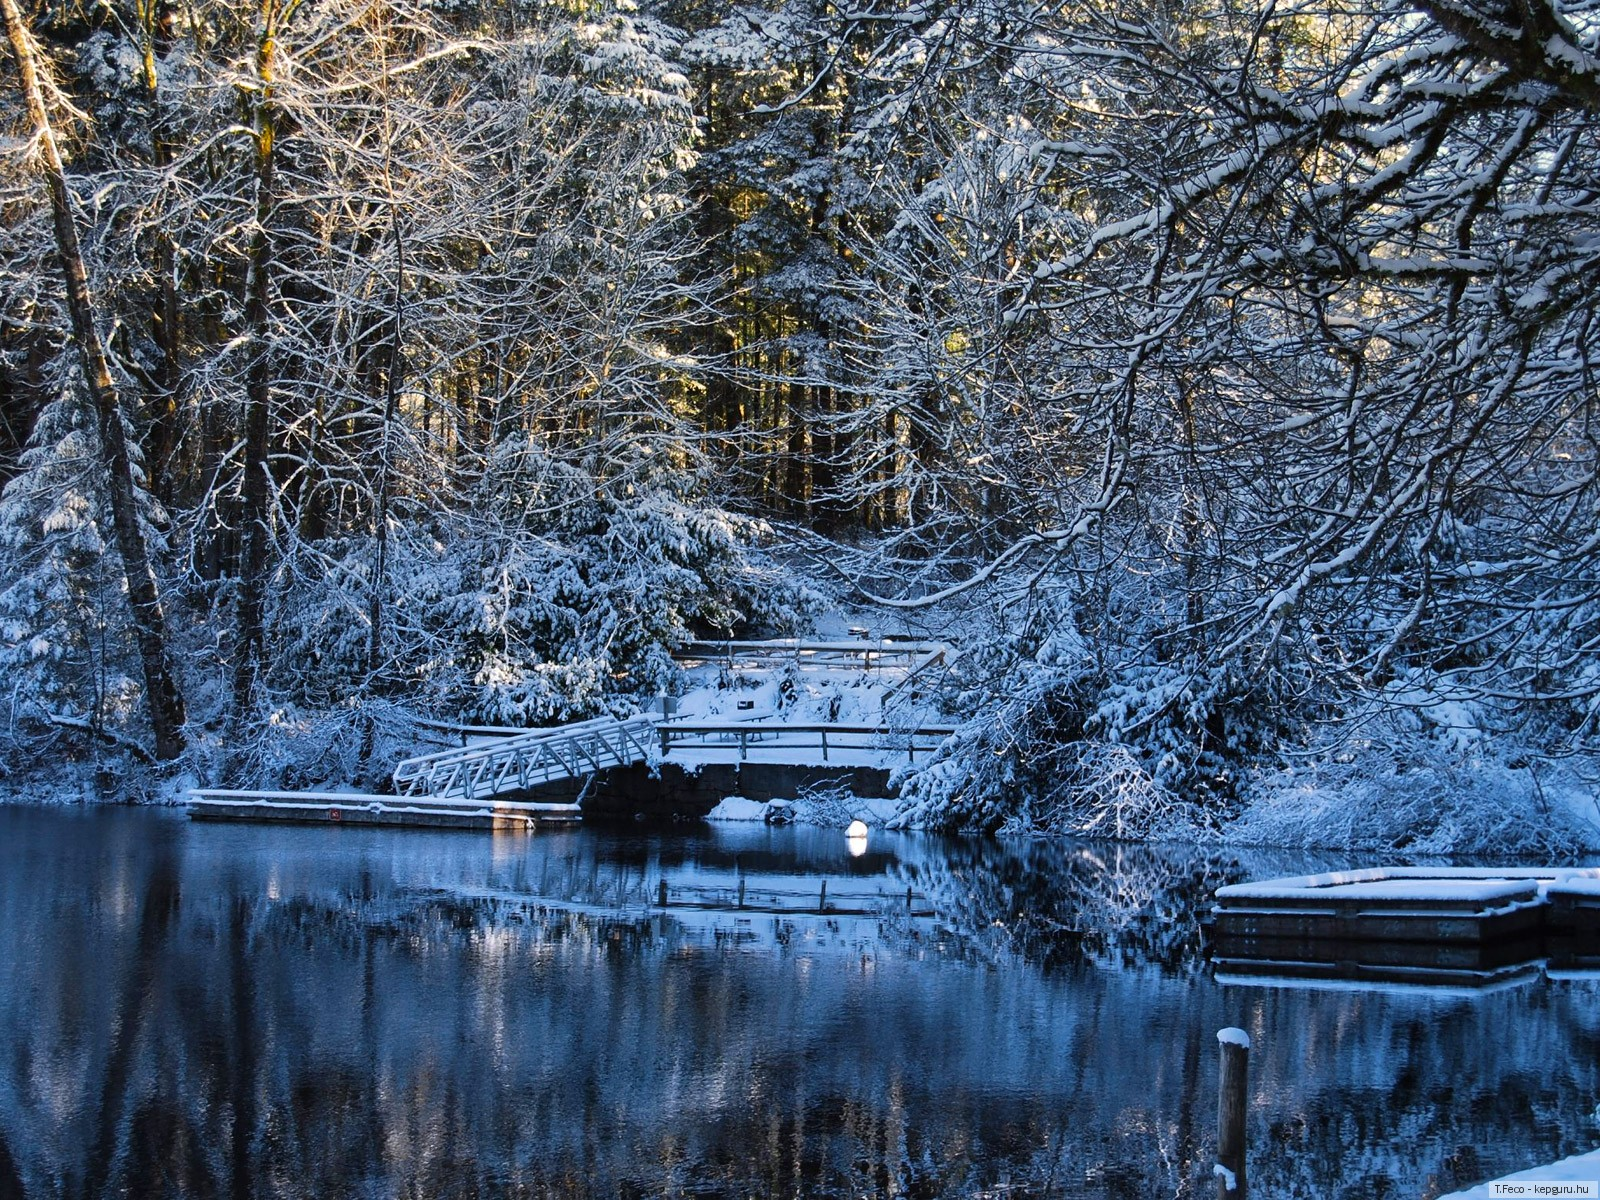 Wallpaper ไหนว่าปีนี้จะหนาวสุดในรอบ 30 ปี 50 Pic 230895-svetik